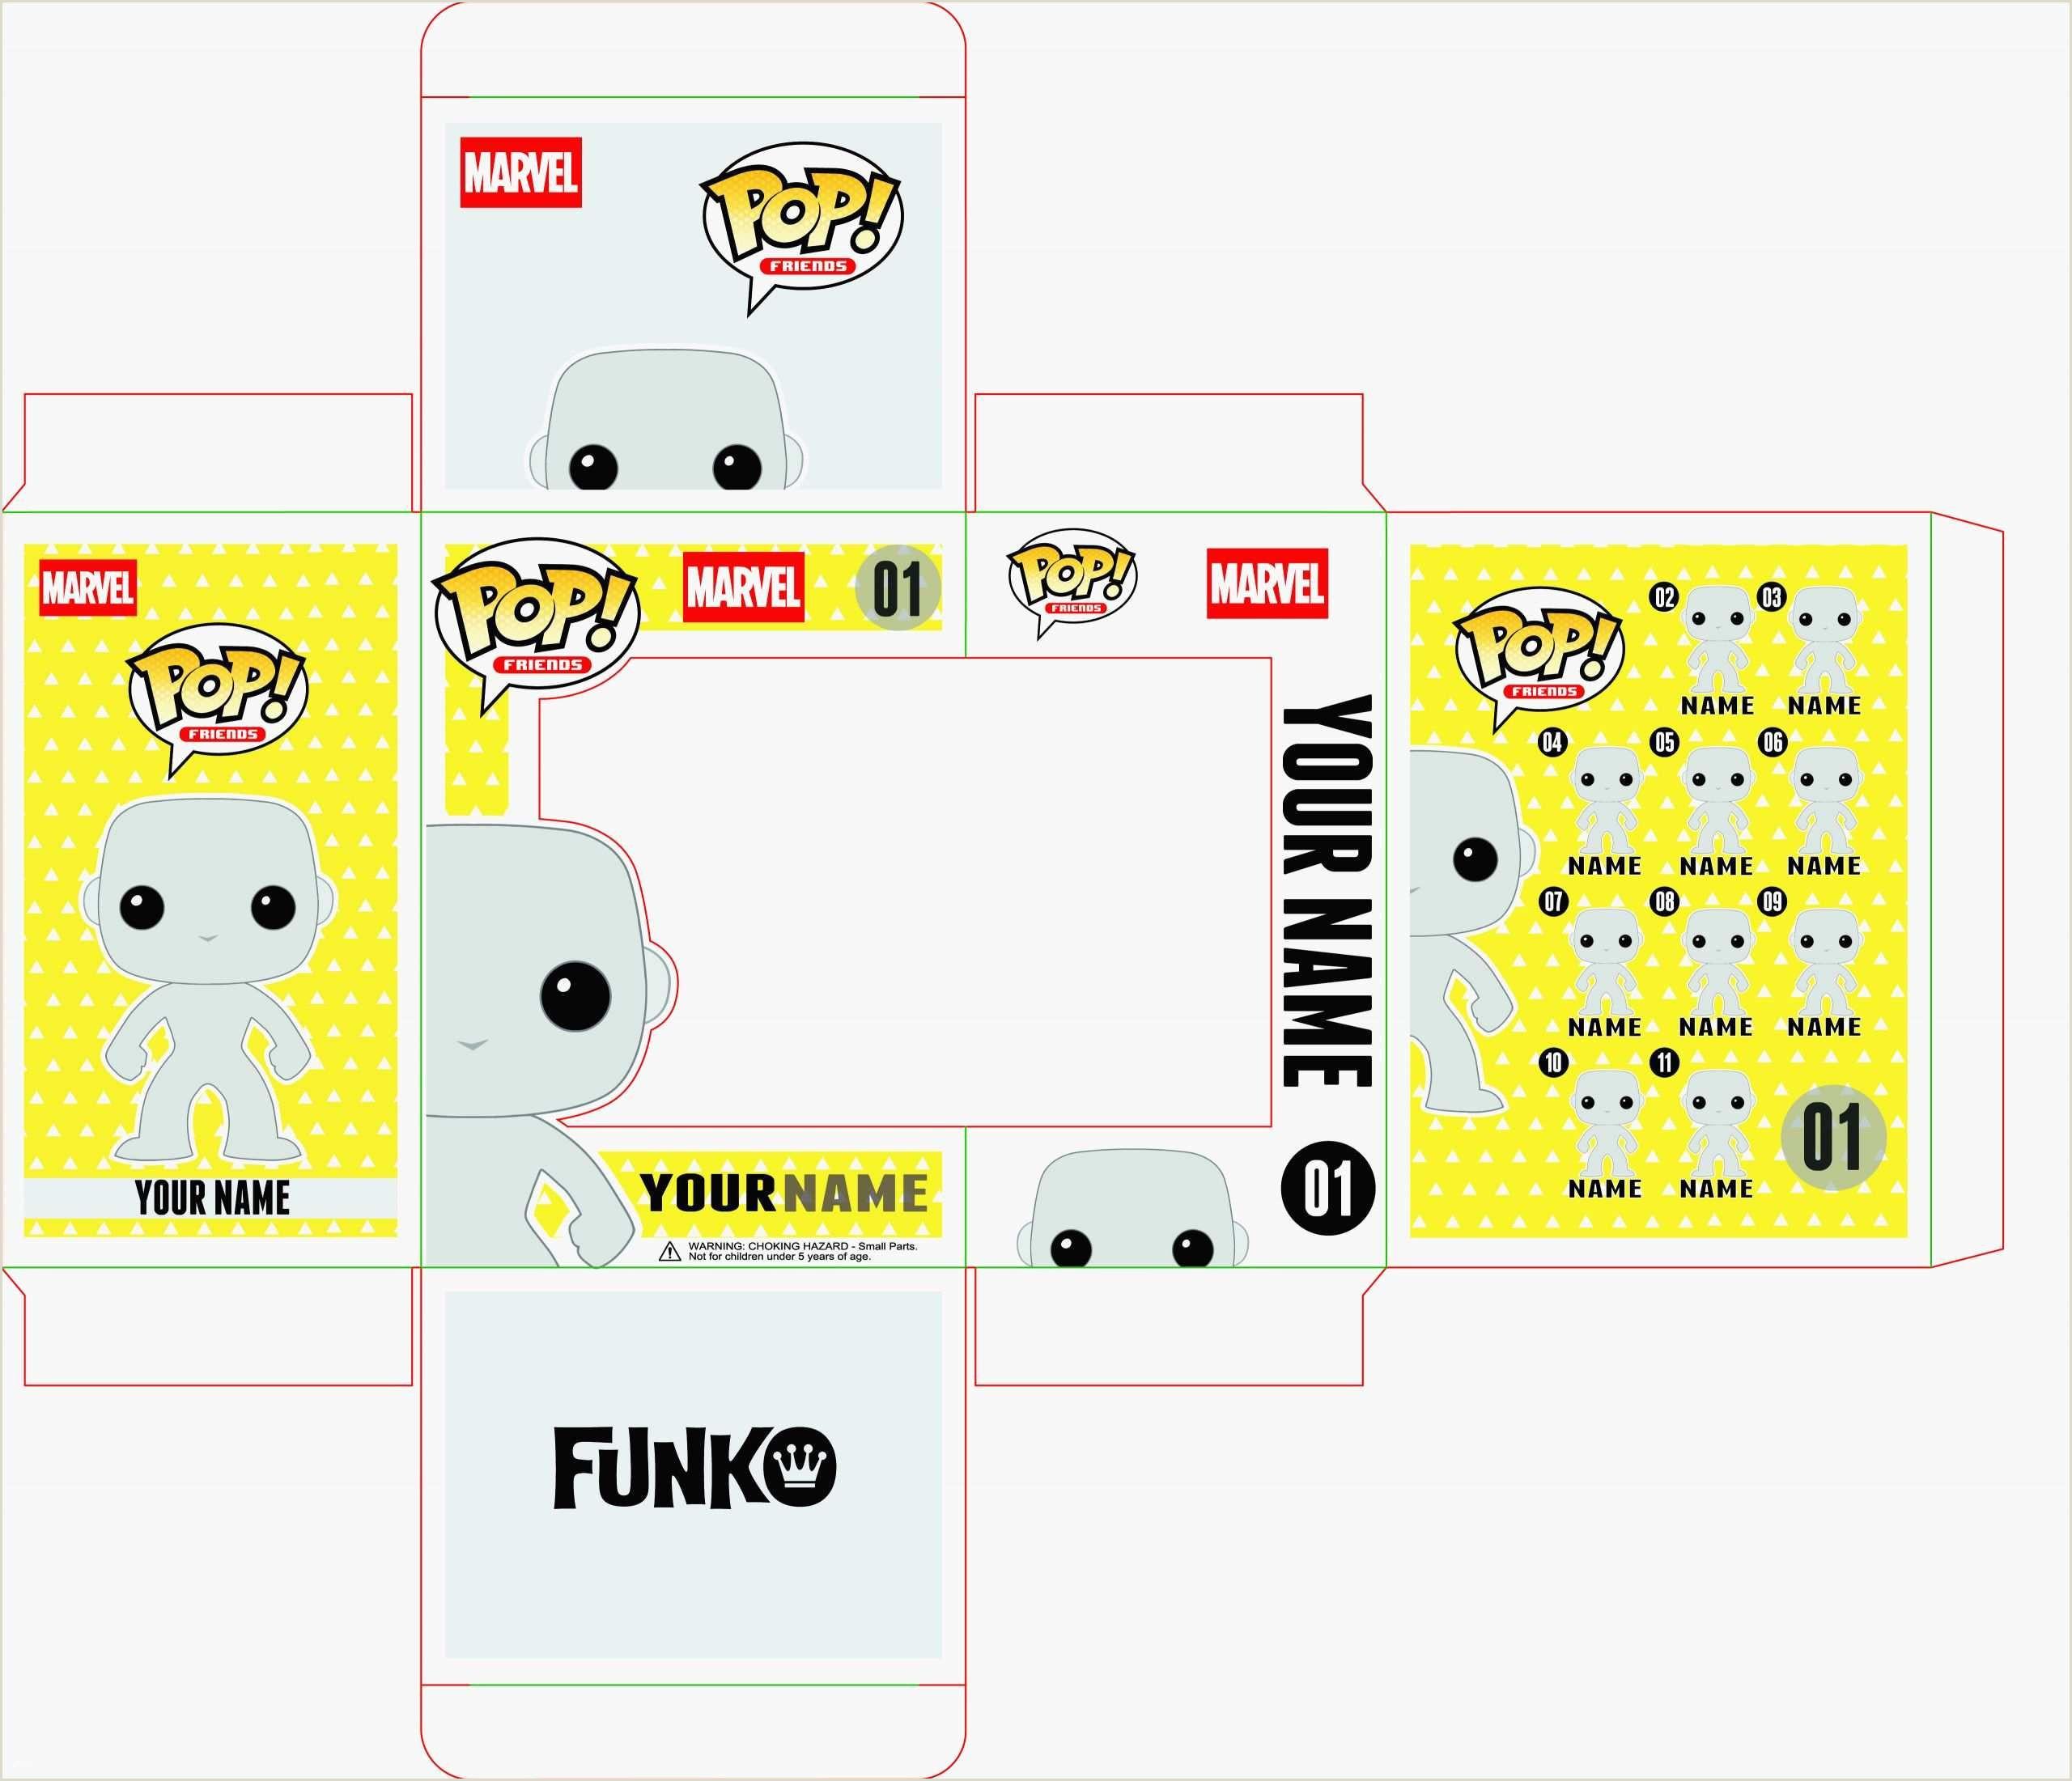 Design Your Own Pop 14 Phenomenal Funko Pop Box Template For 2020 In 2020